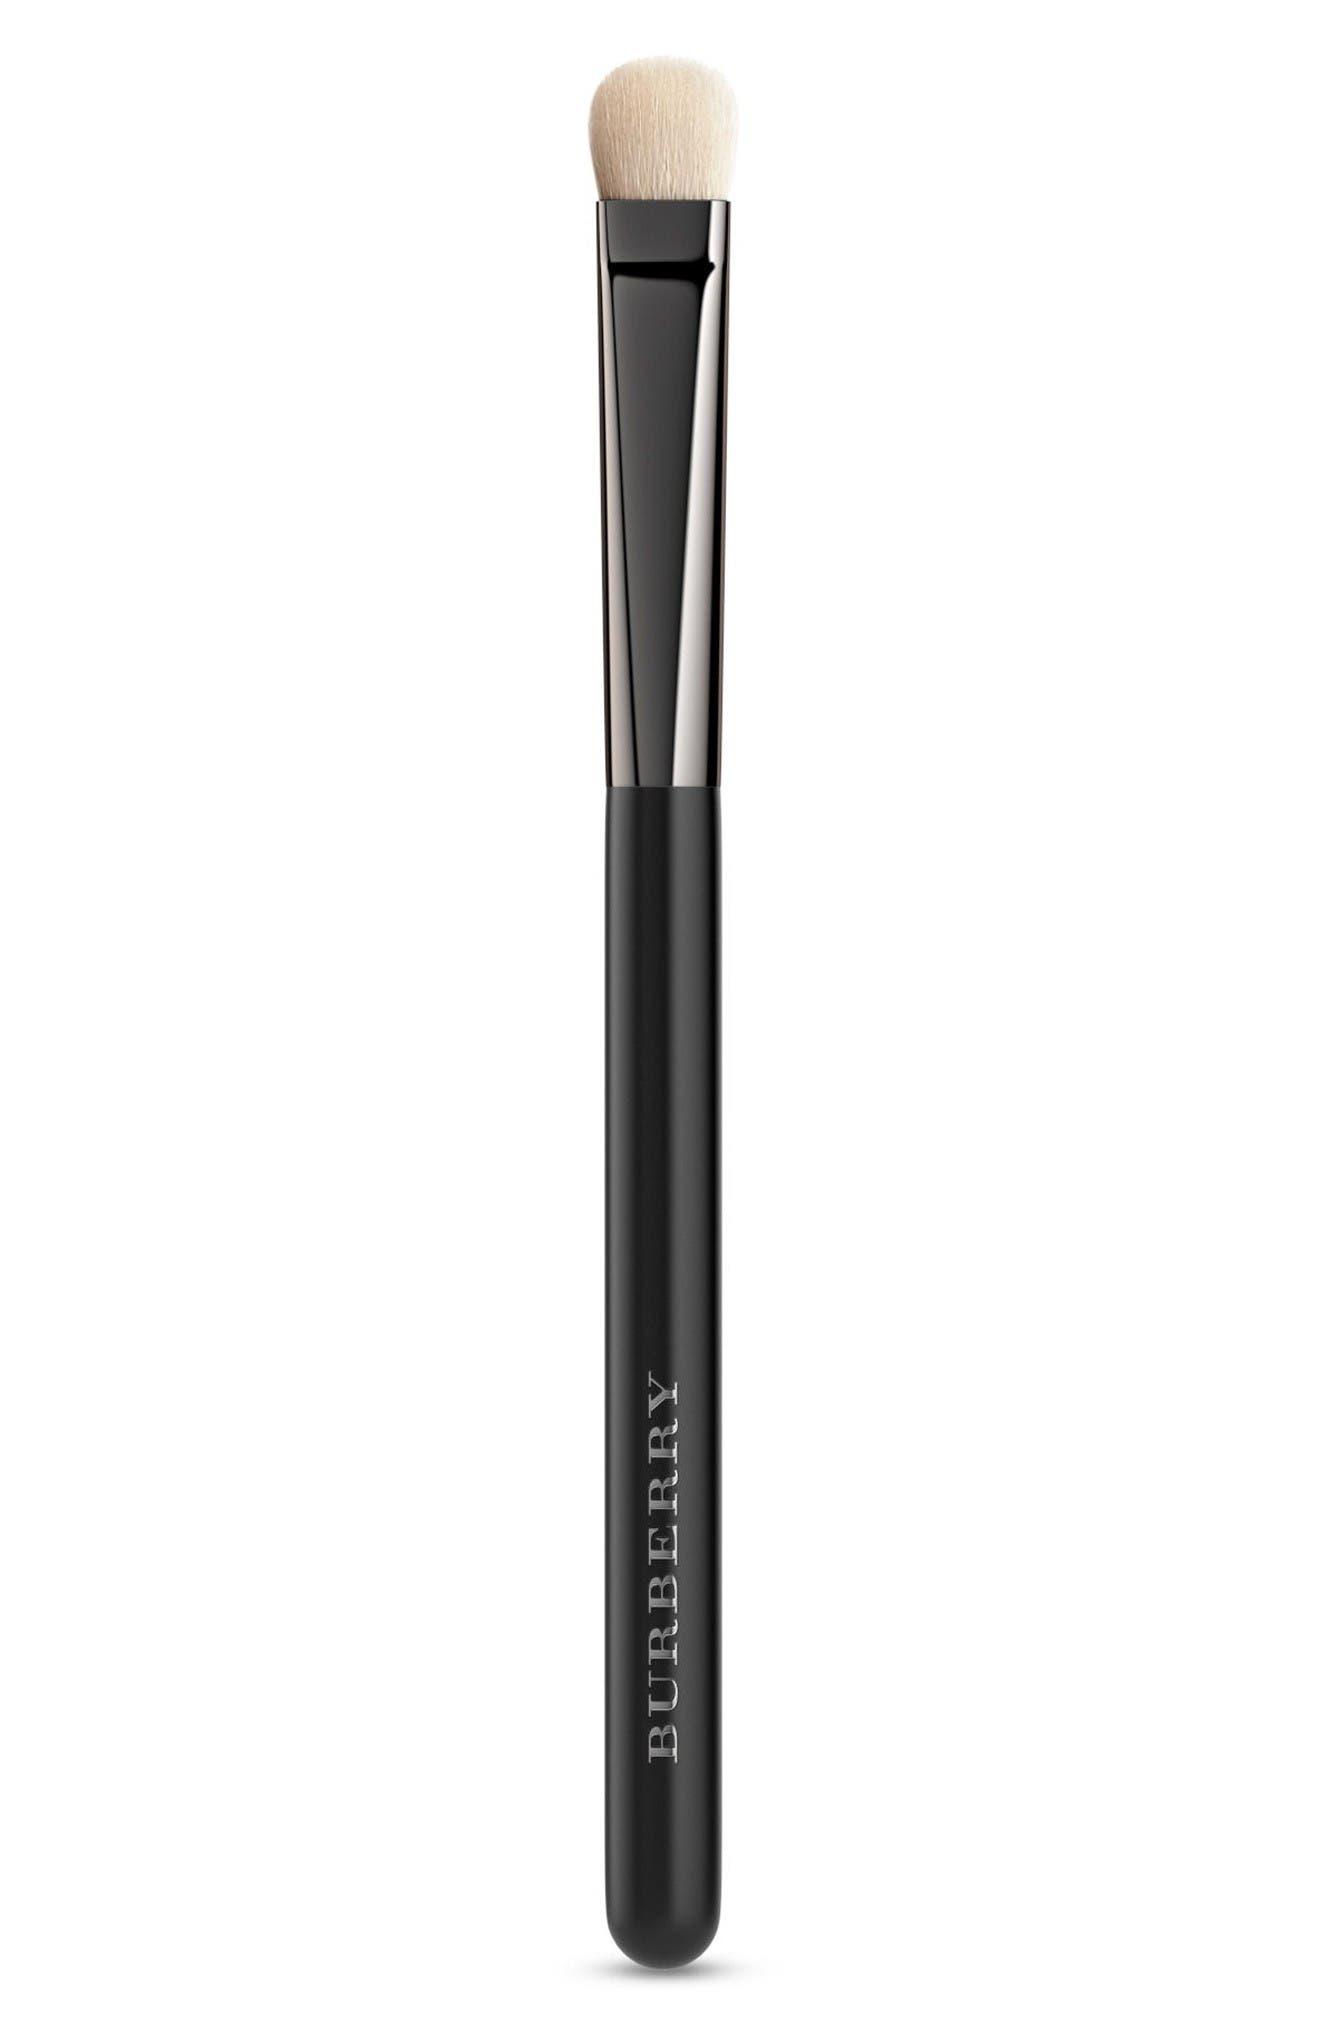 Burberry Beauty Small Eyeshadow Brush No. 11